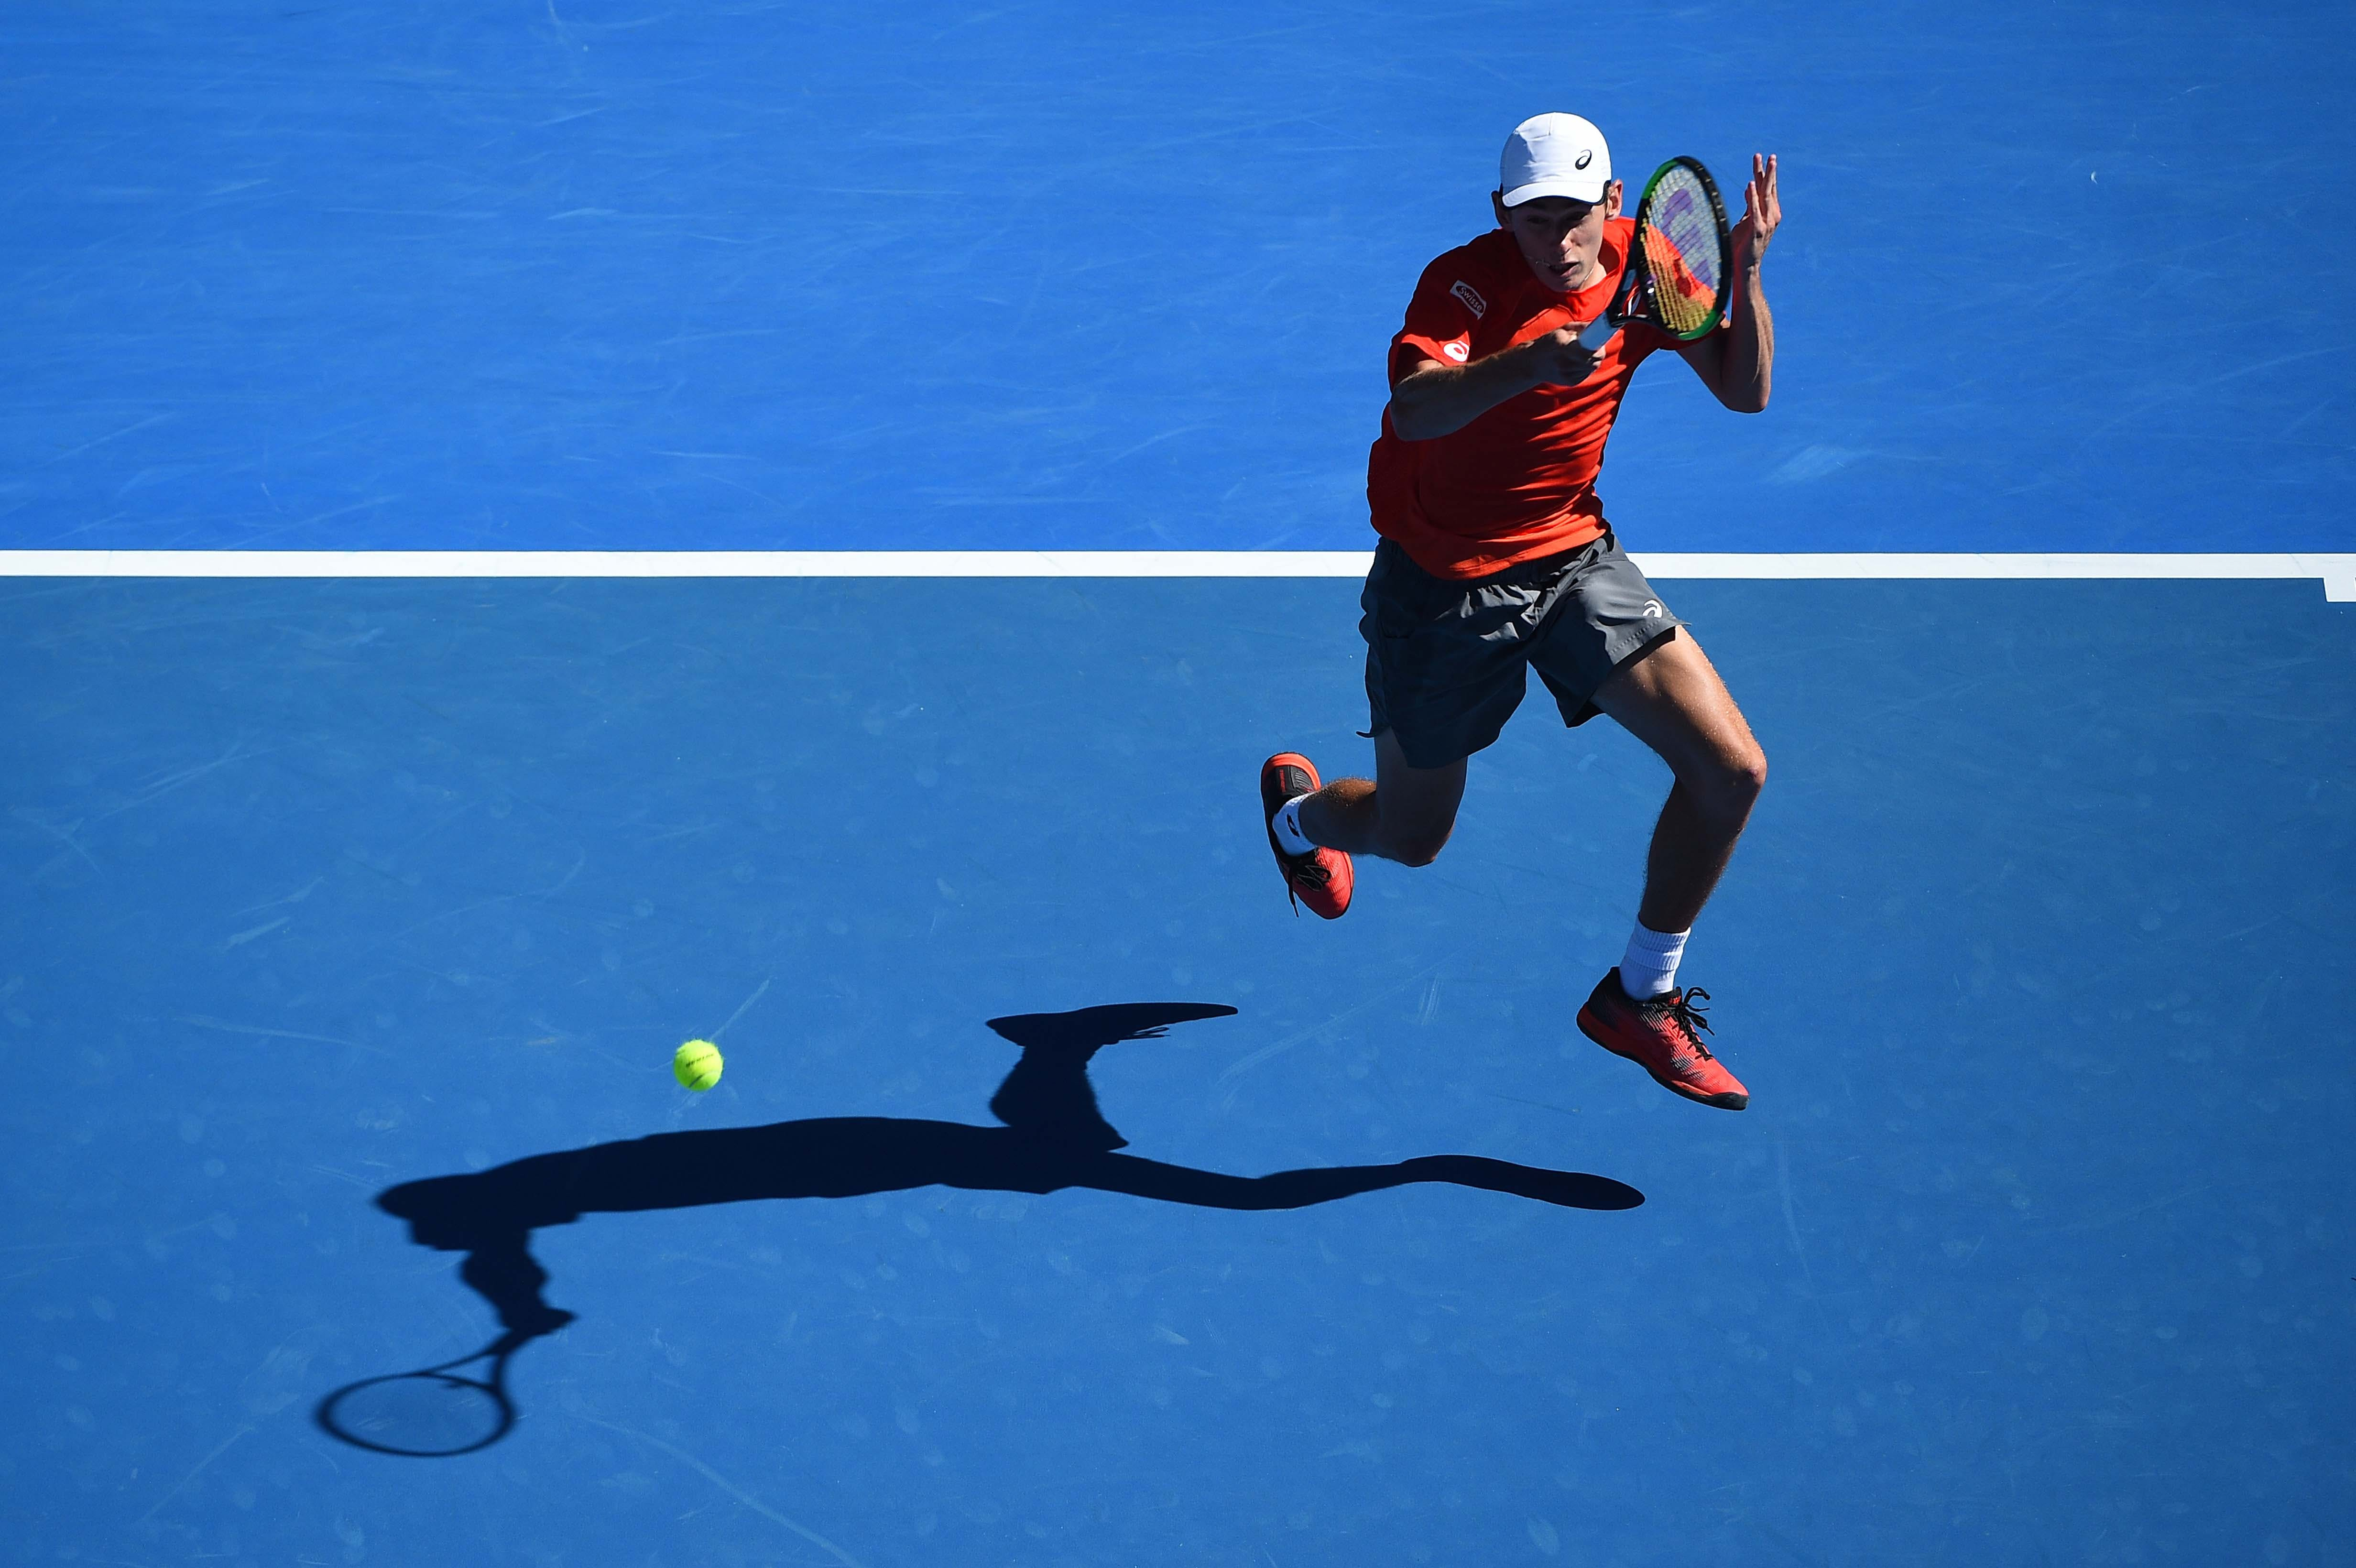 Alex de Minaur jumping during his second round match at the 2019 Australian Open